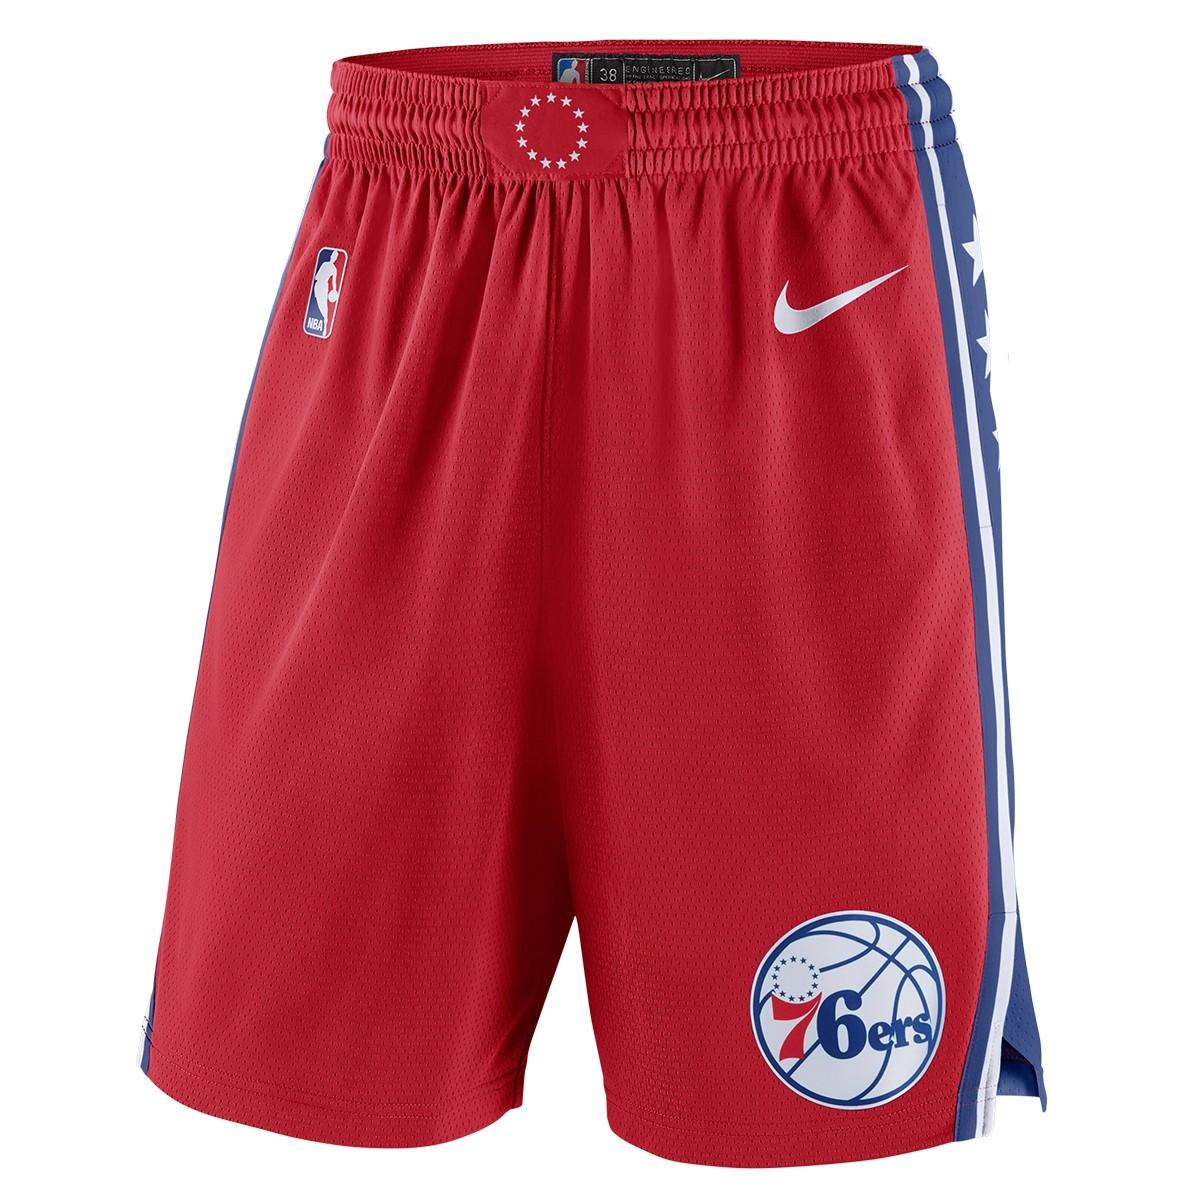 Nike NBA Phila Swingman Short 19/20 'Statement Edition'